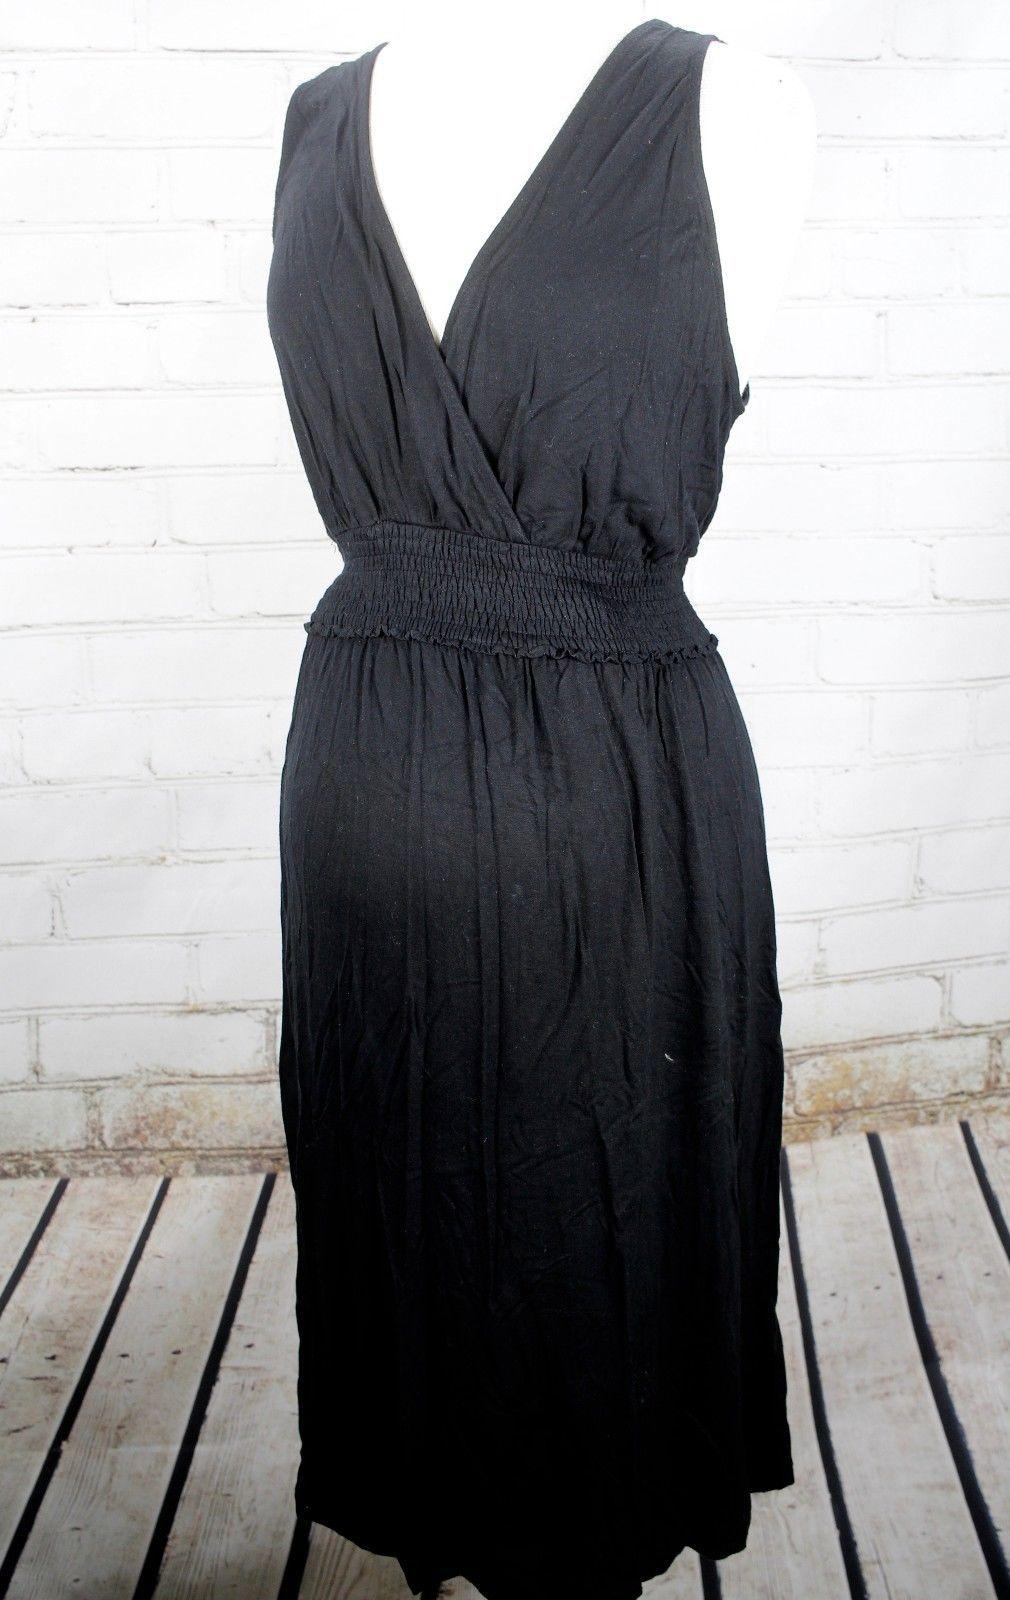 b584d2def55df 57. 57. Previous. Liz Lange Maternity Sleeveless Dress V-Neck Wrap Size  Large Knit Stretch Nursing